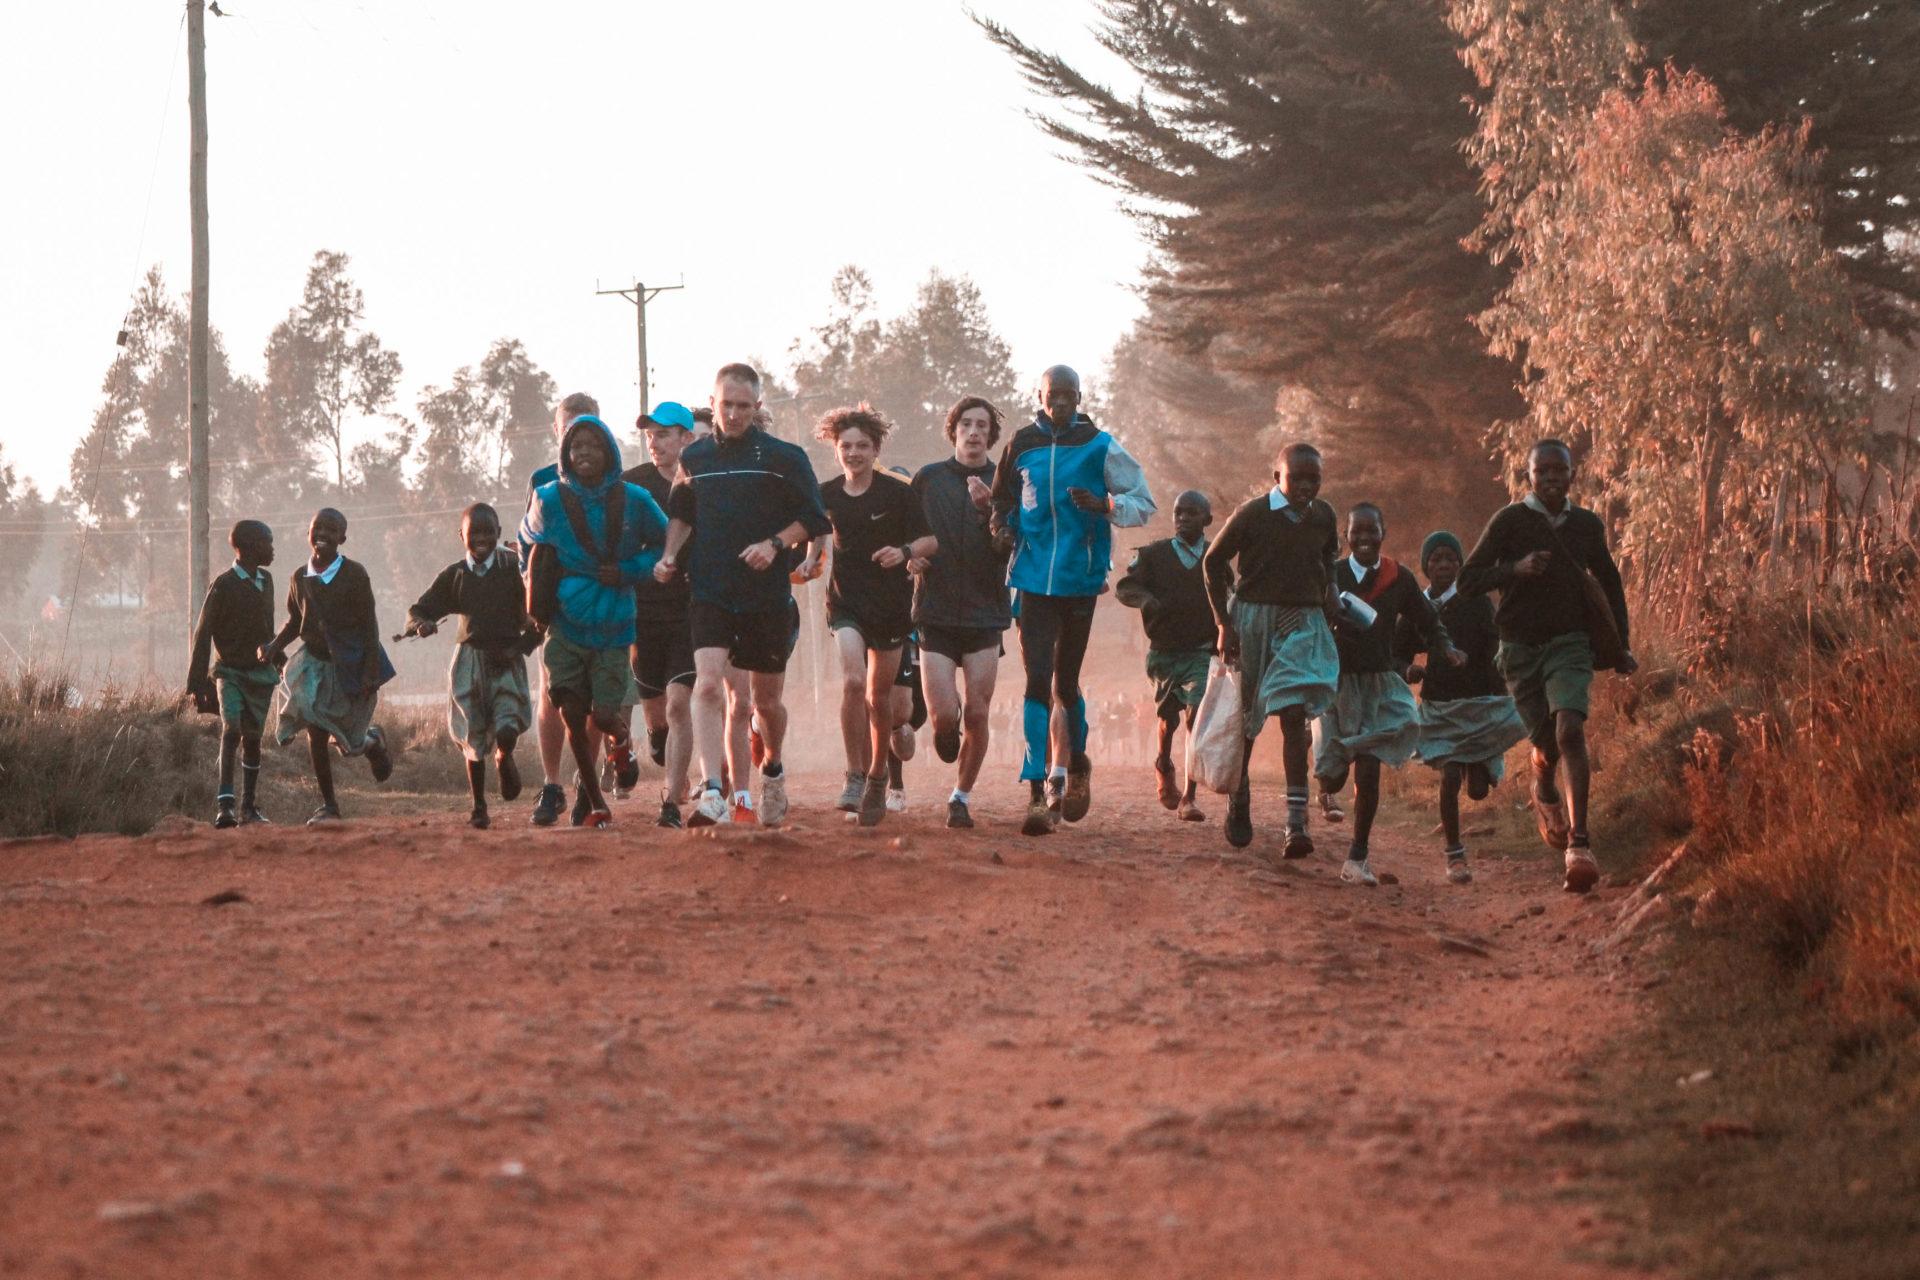 Westlake school morning run on trails with kenya school kids